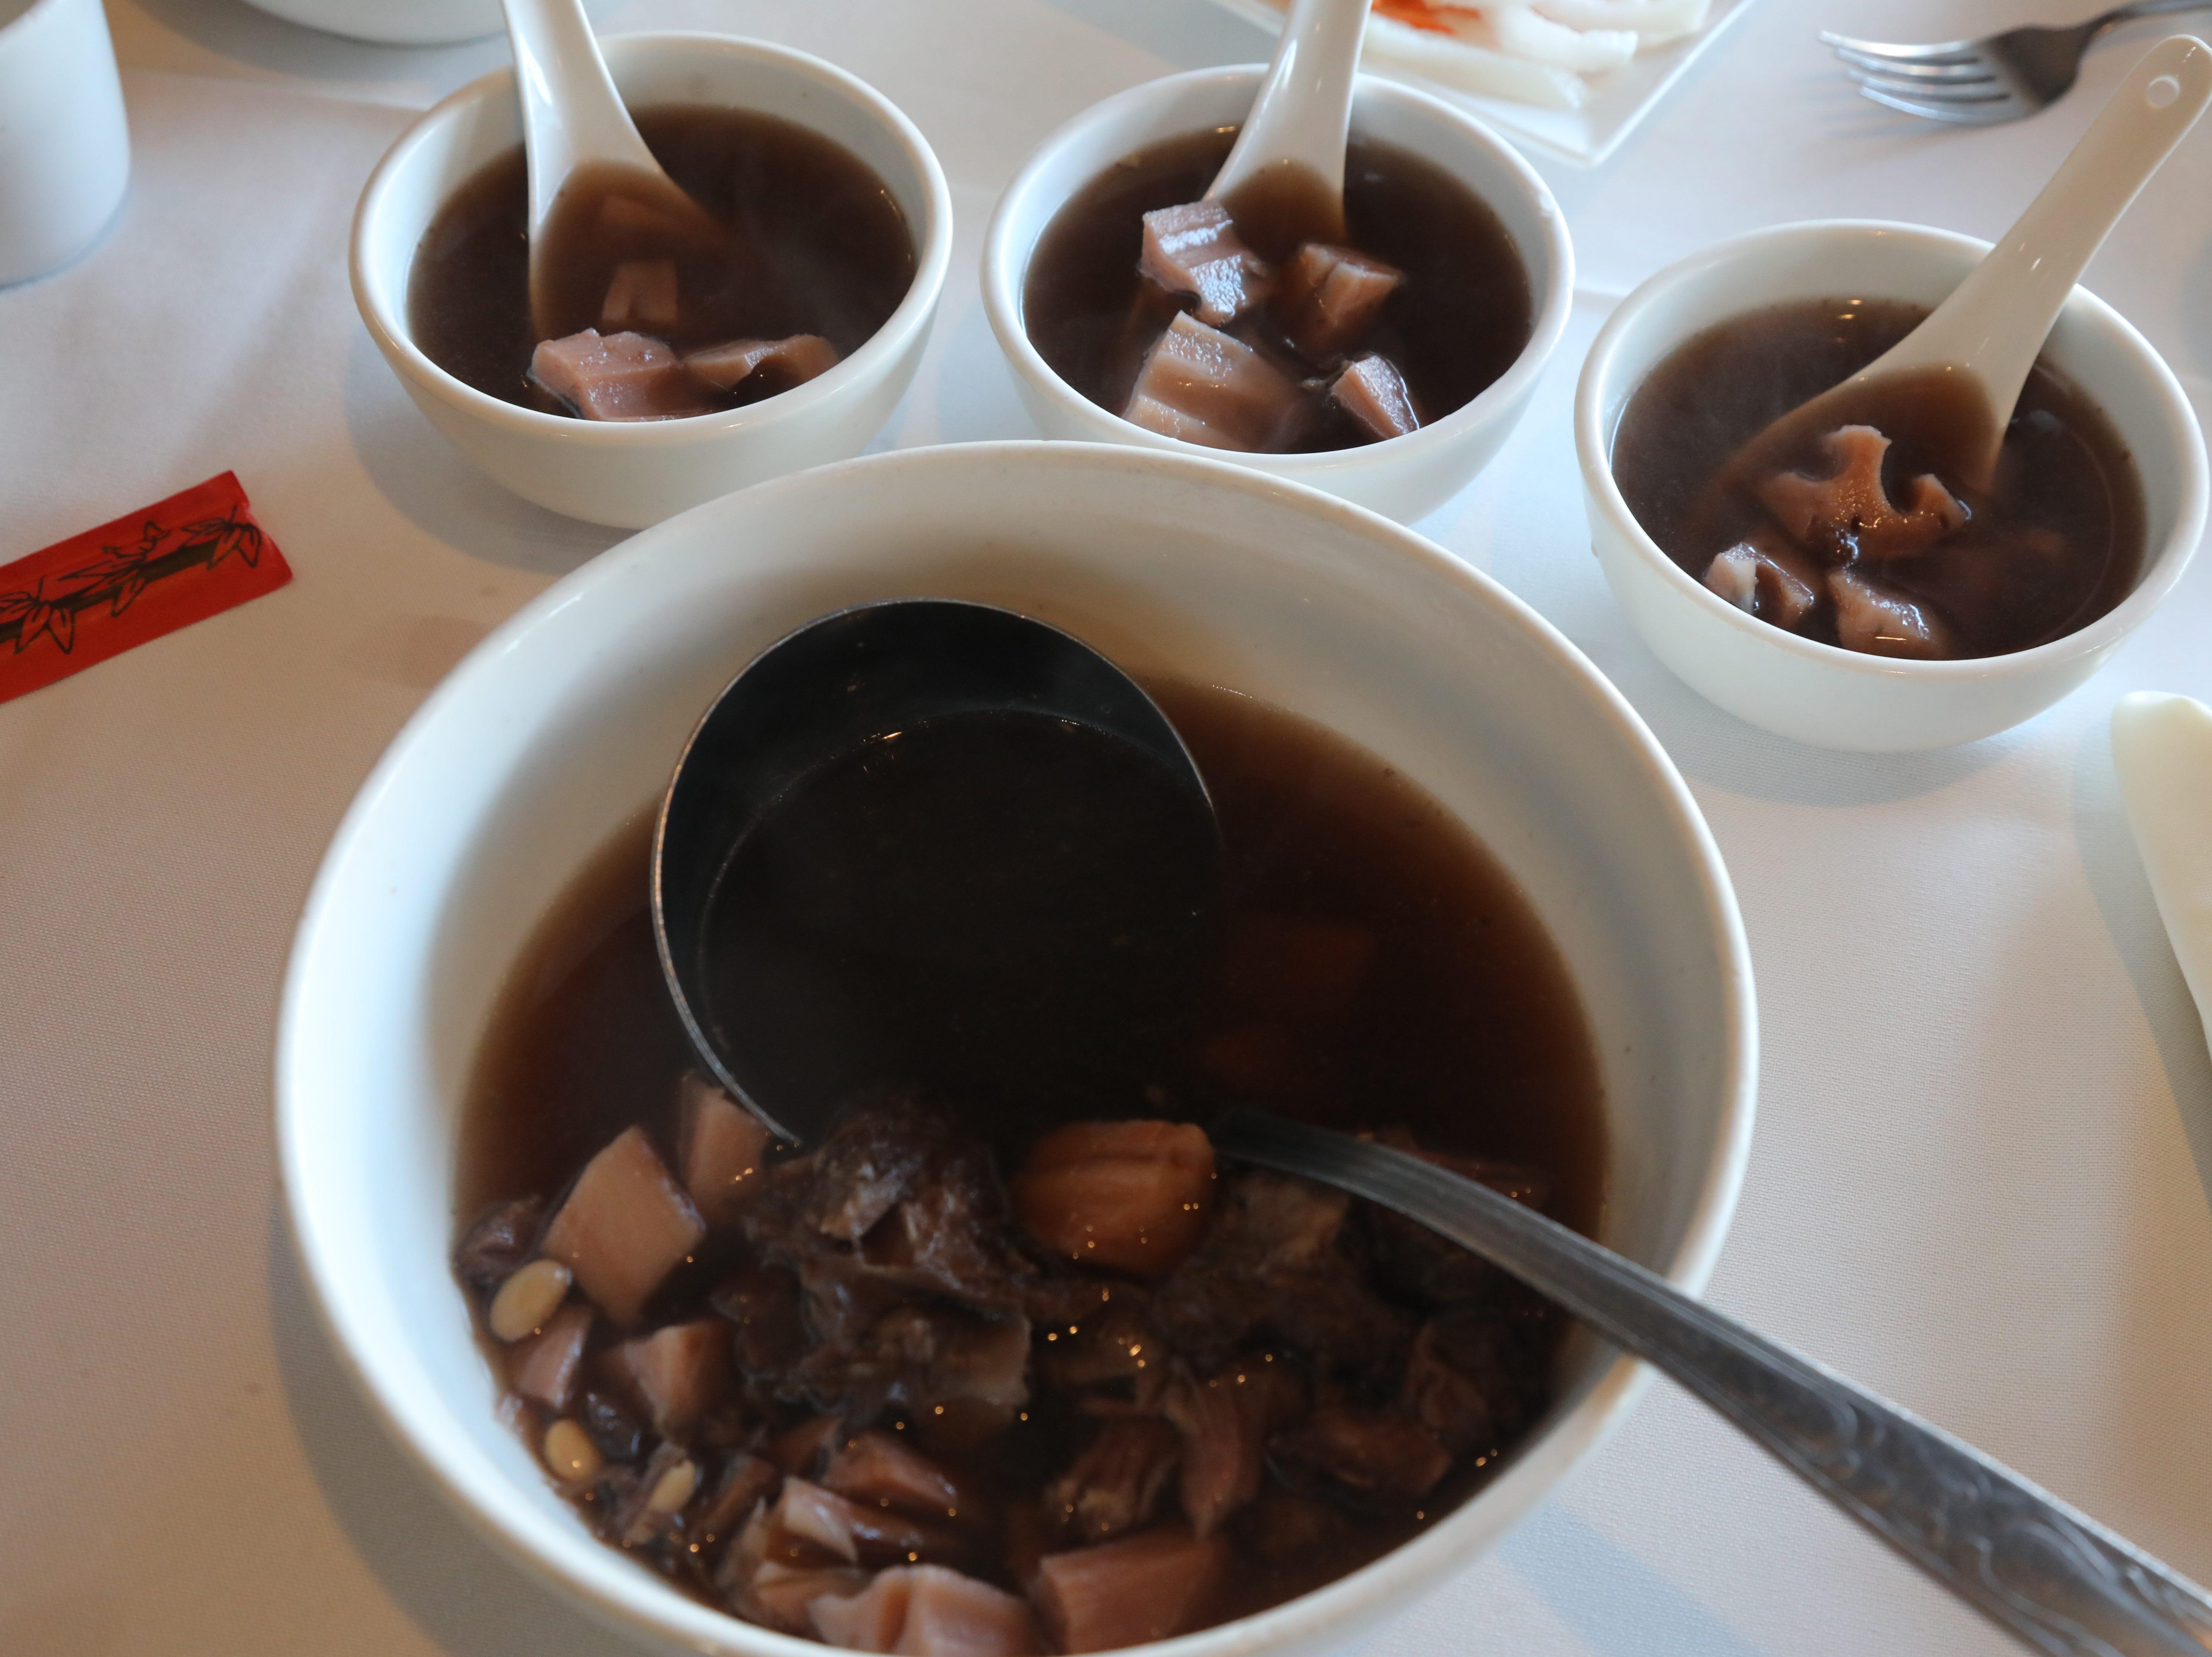 Soup at the Jasper Restaurant.